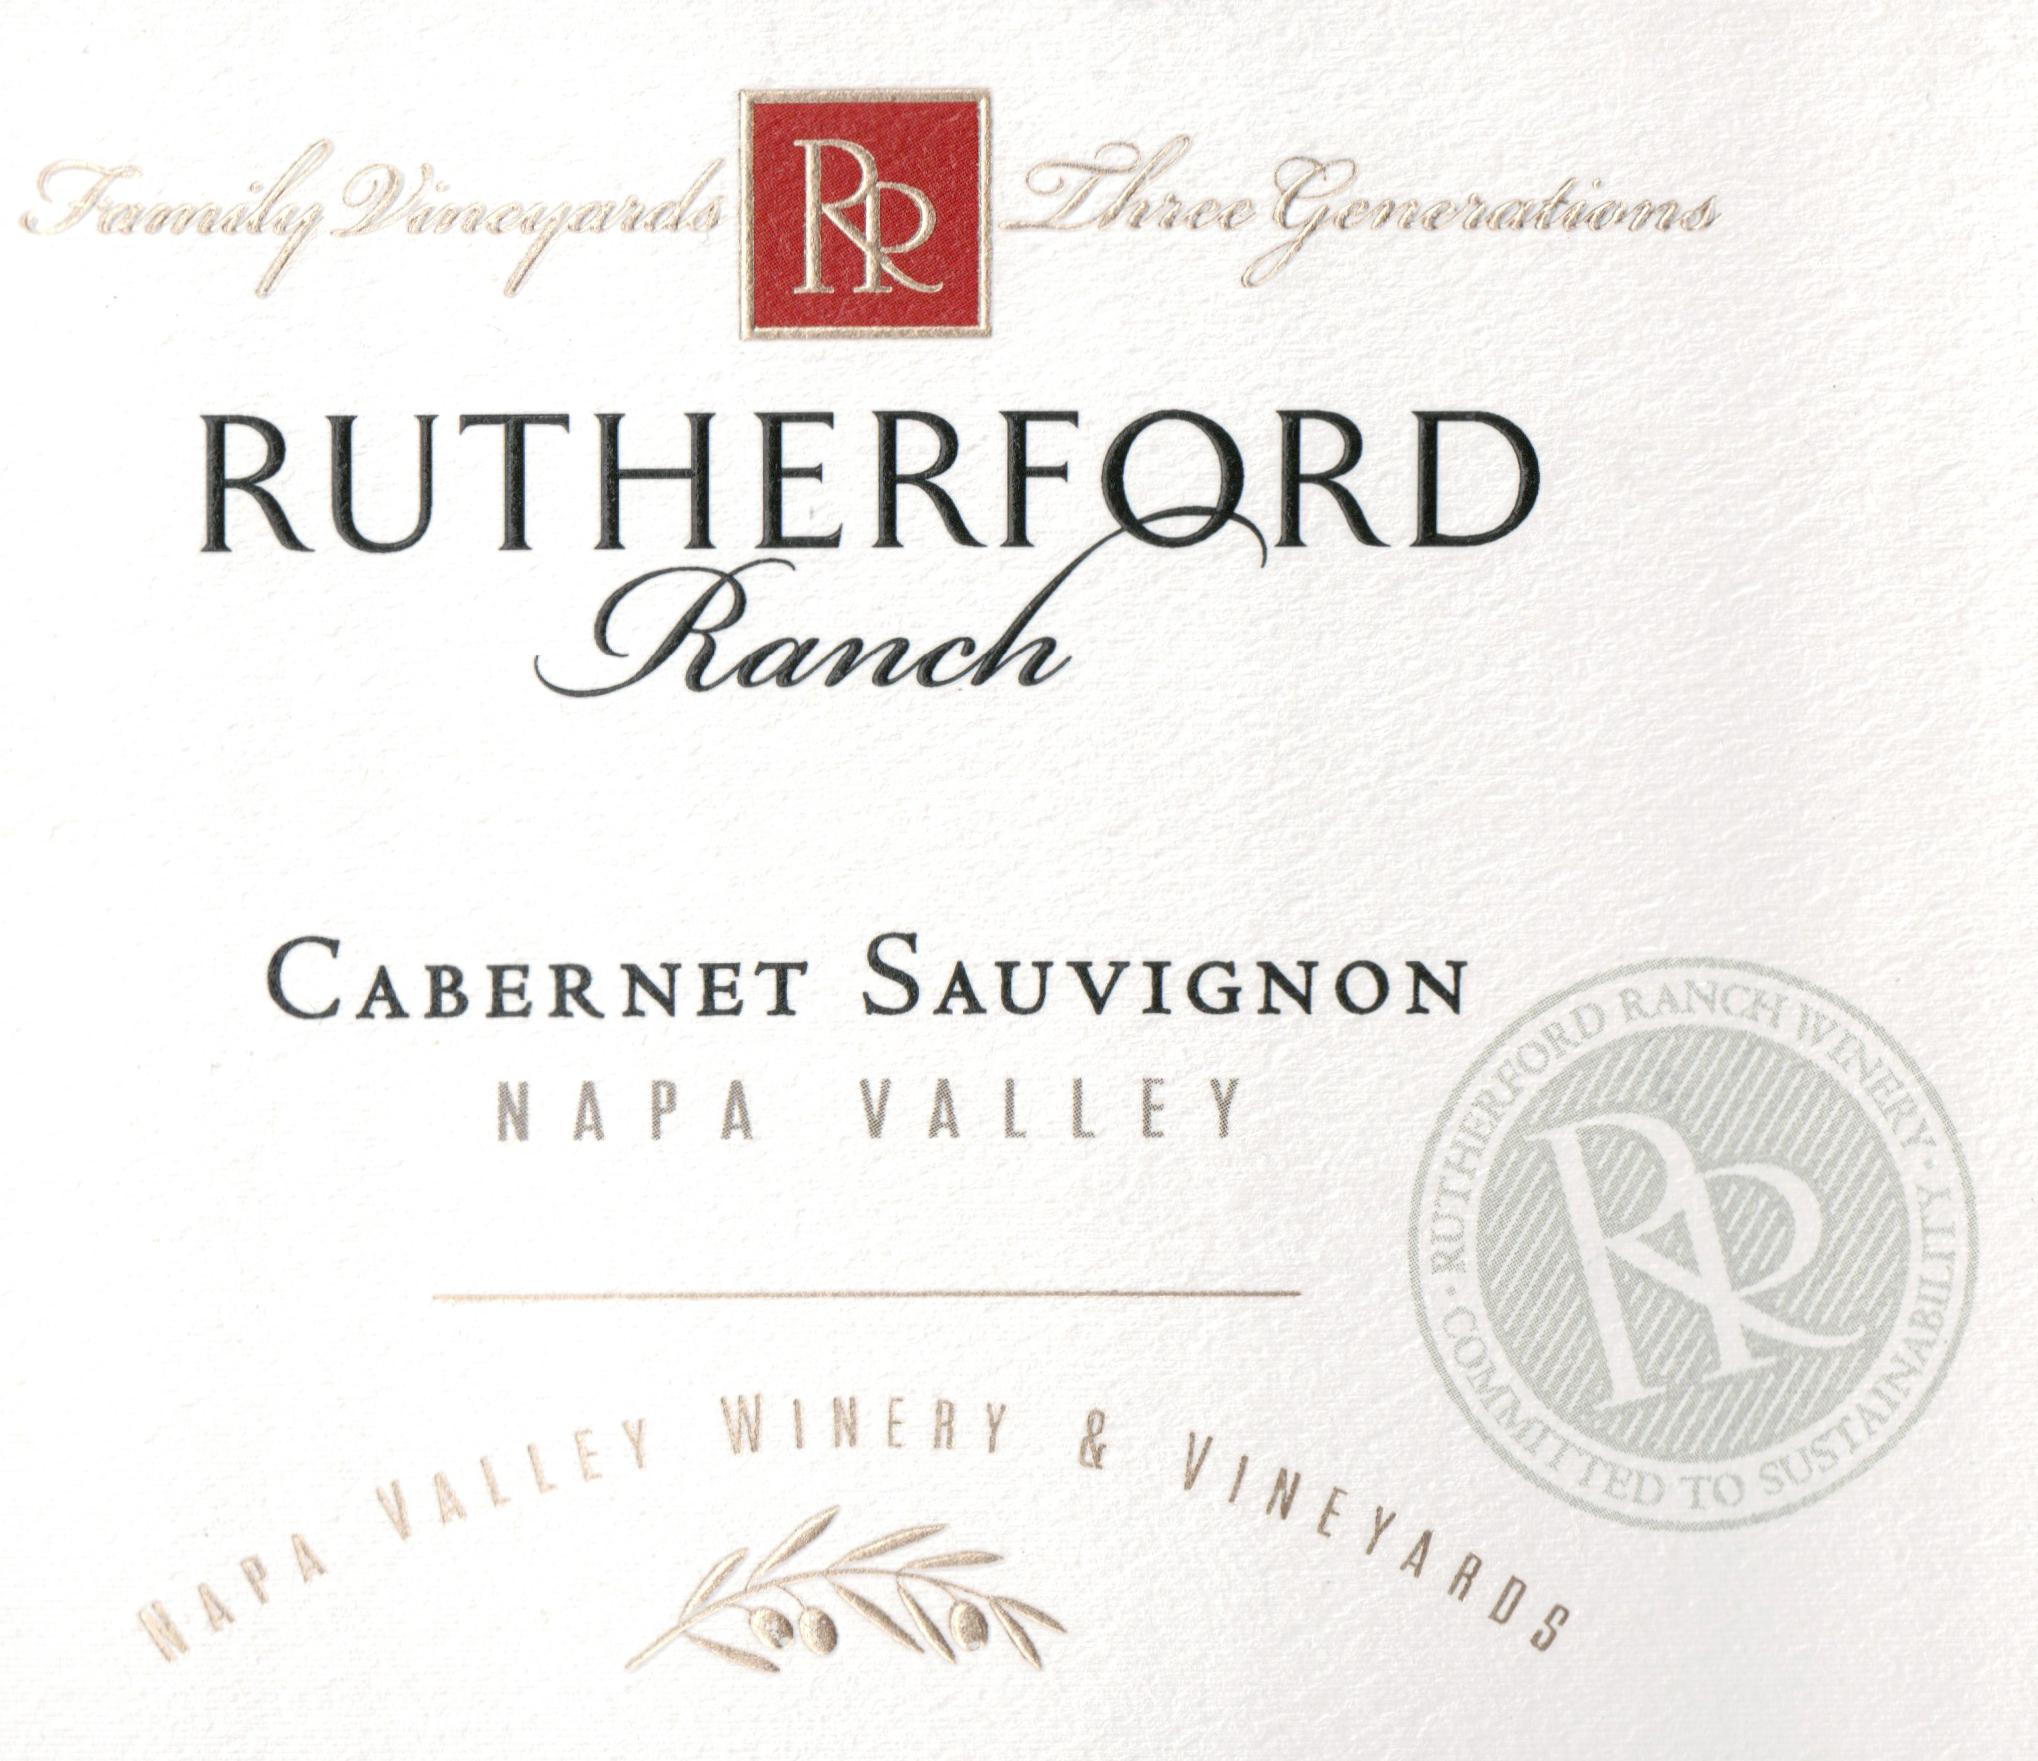 Rutherford Ranch Cabernet Sauvignon Half Bottle 2017